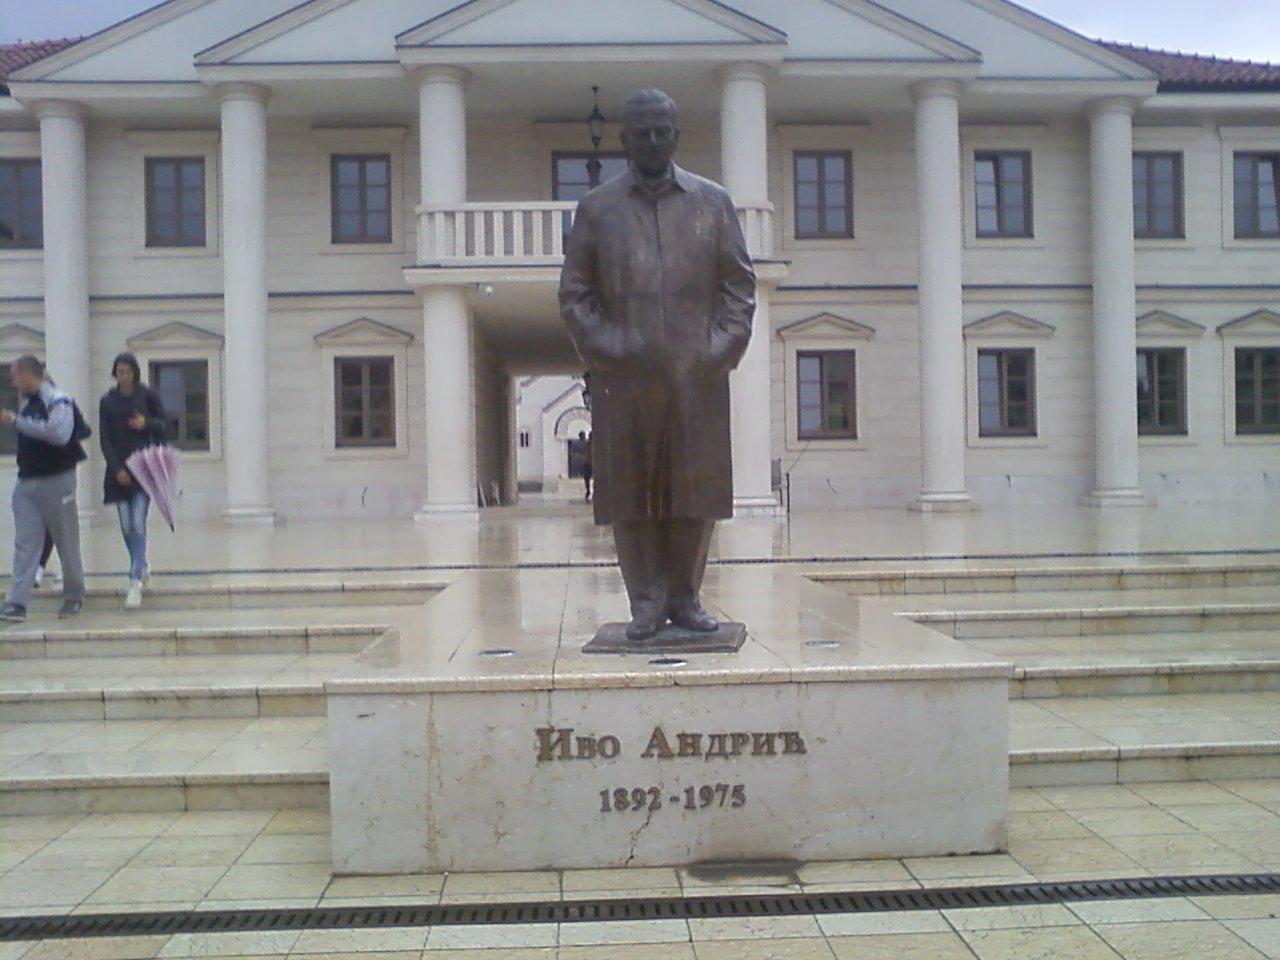 פסל אנדריץ' באנד